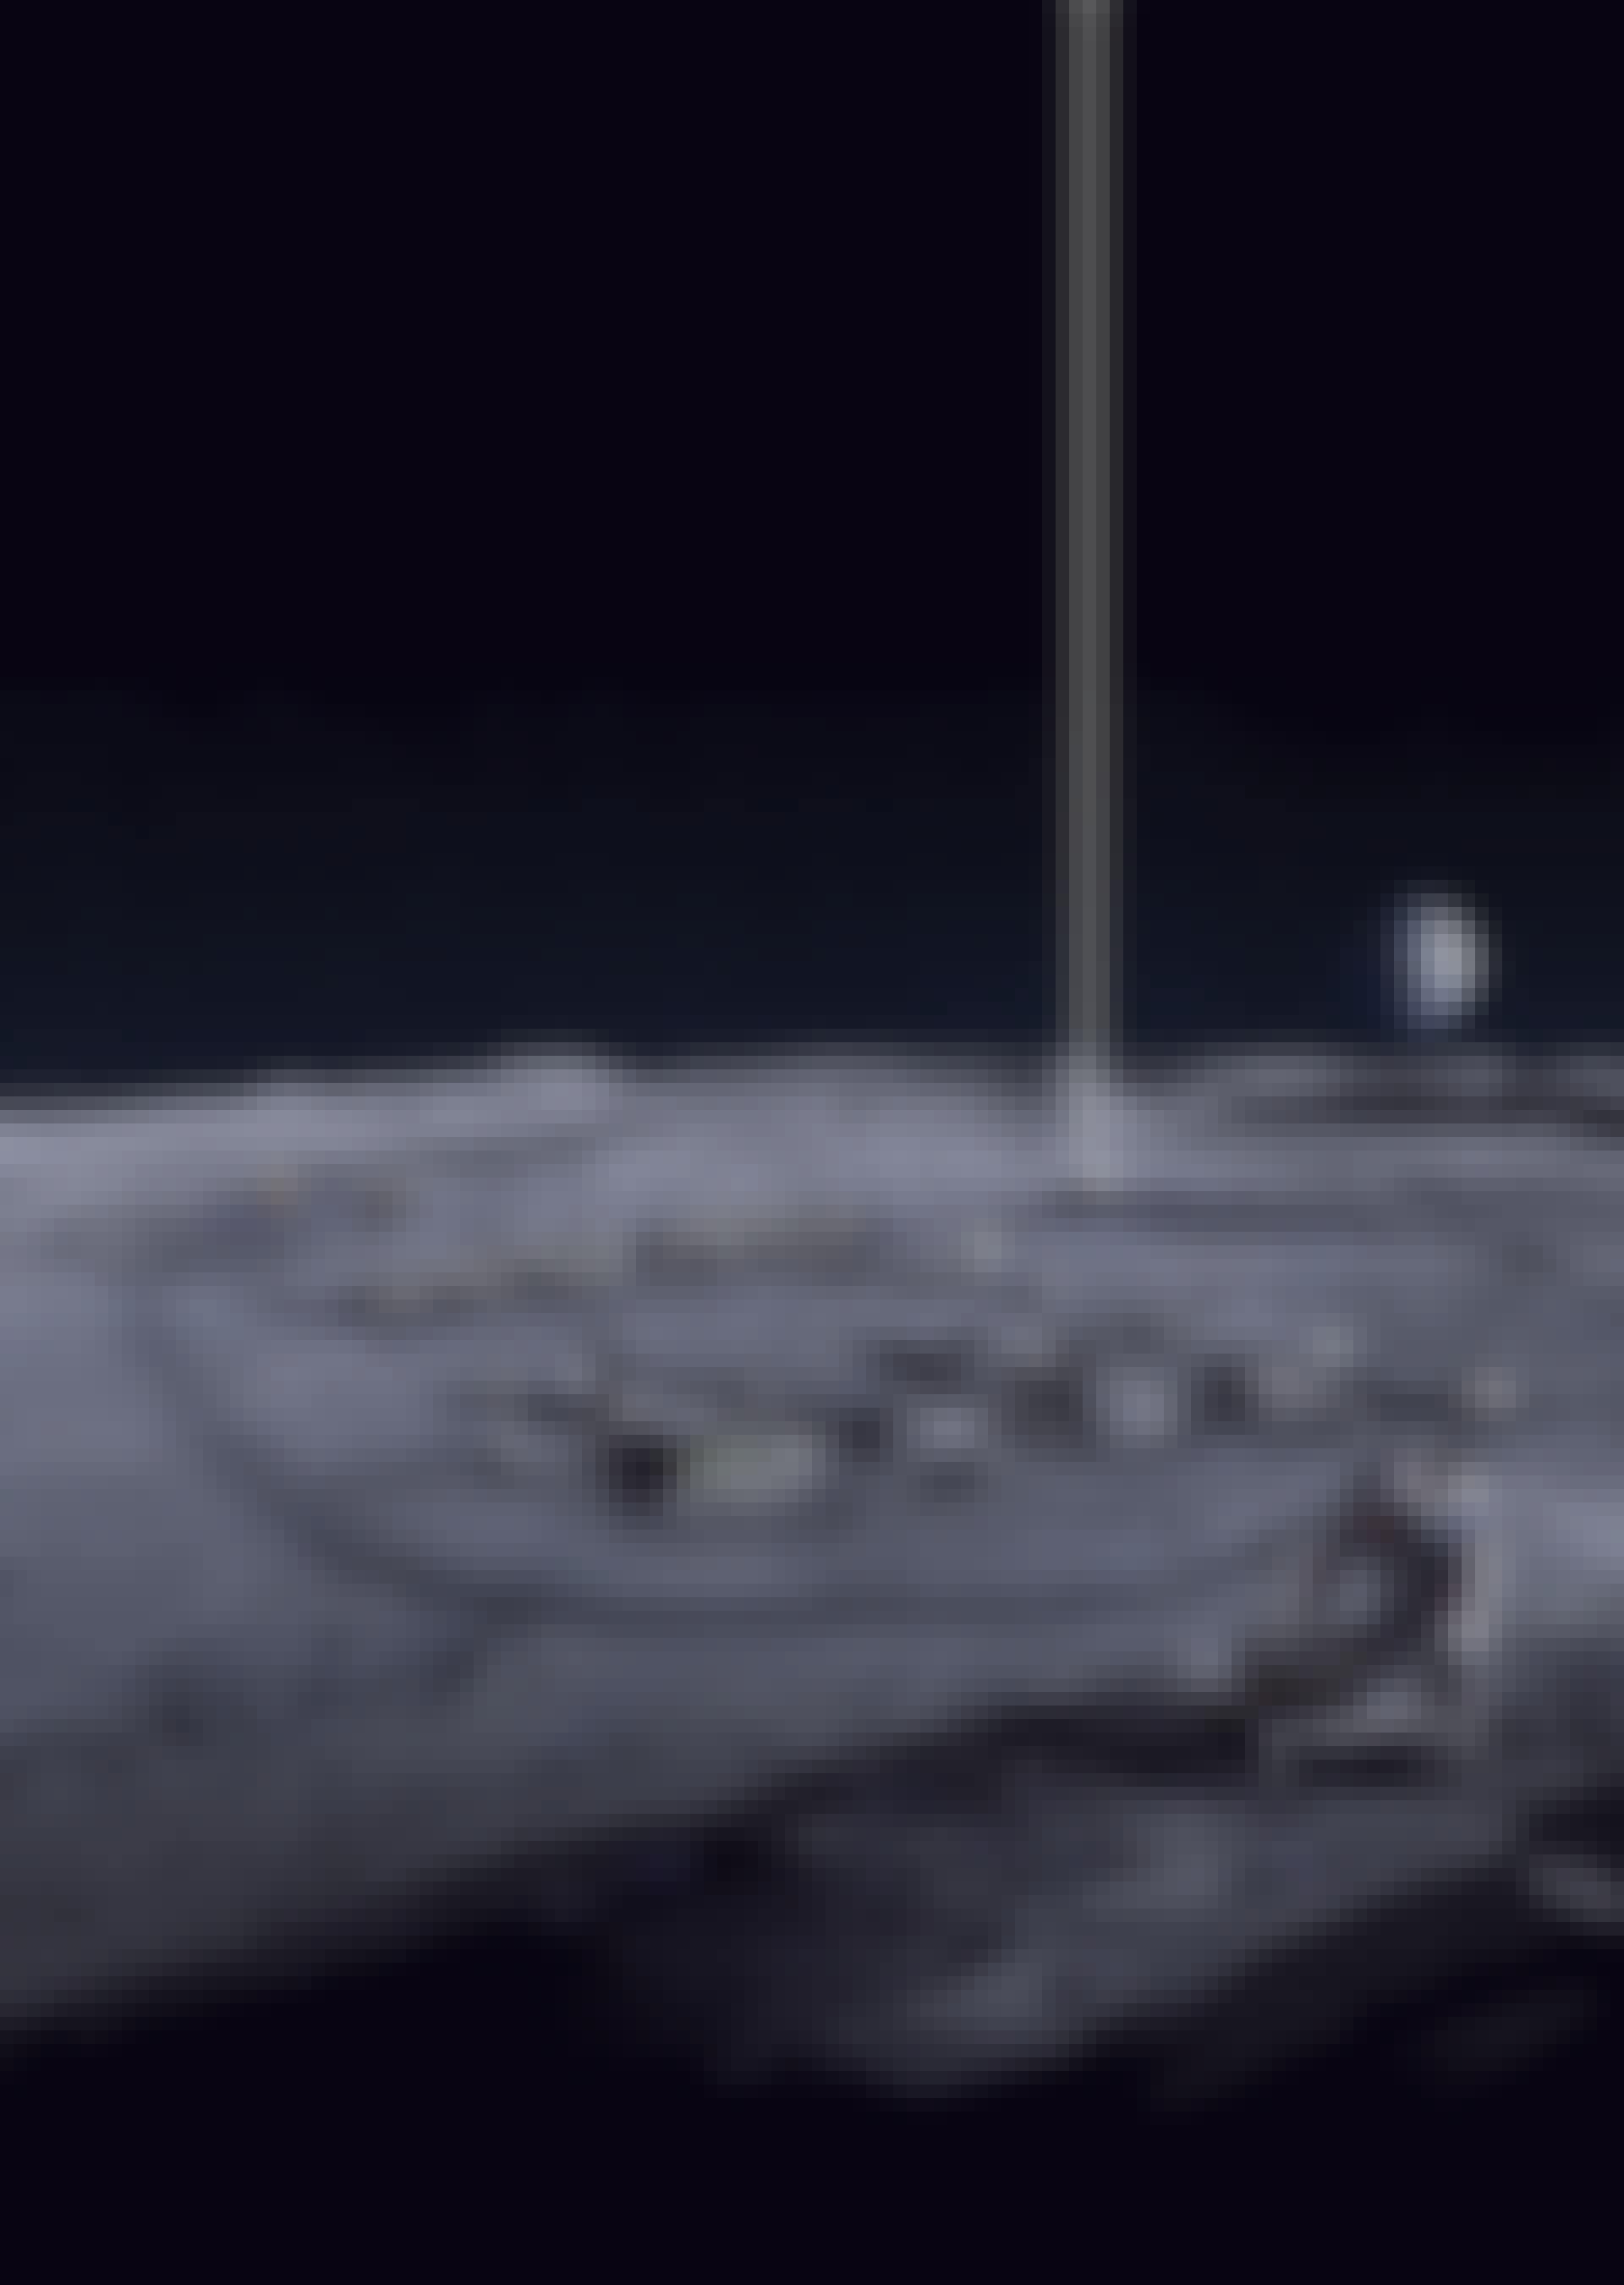 Månebase - vand